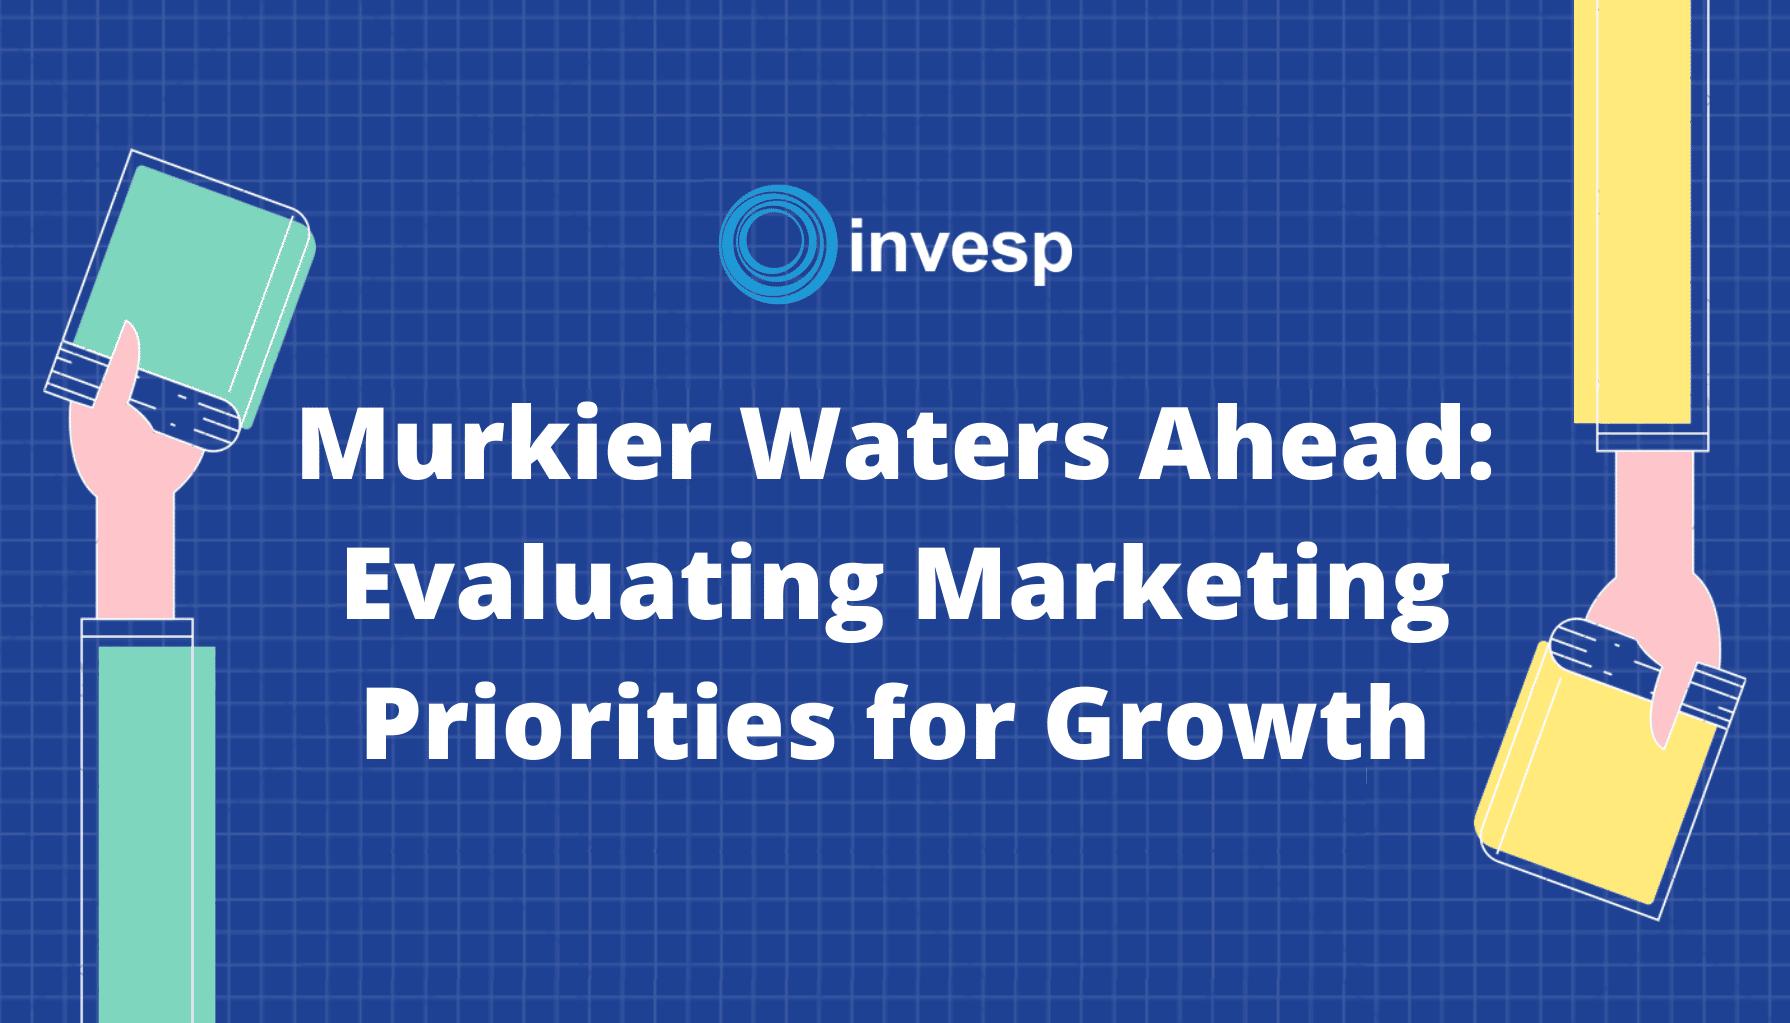 Murkier Waters Ahead: Evaluating Marketing Priorities for Growth